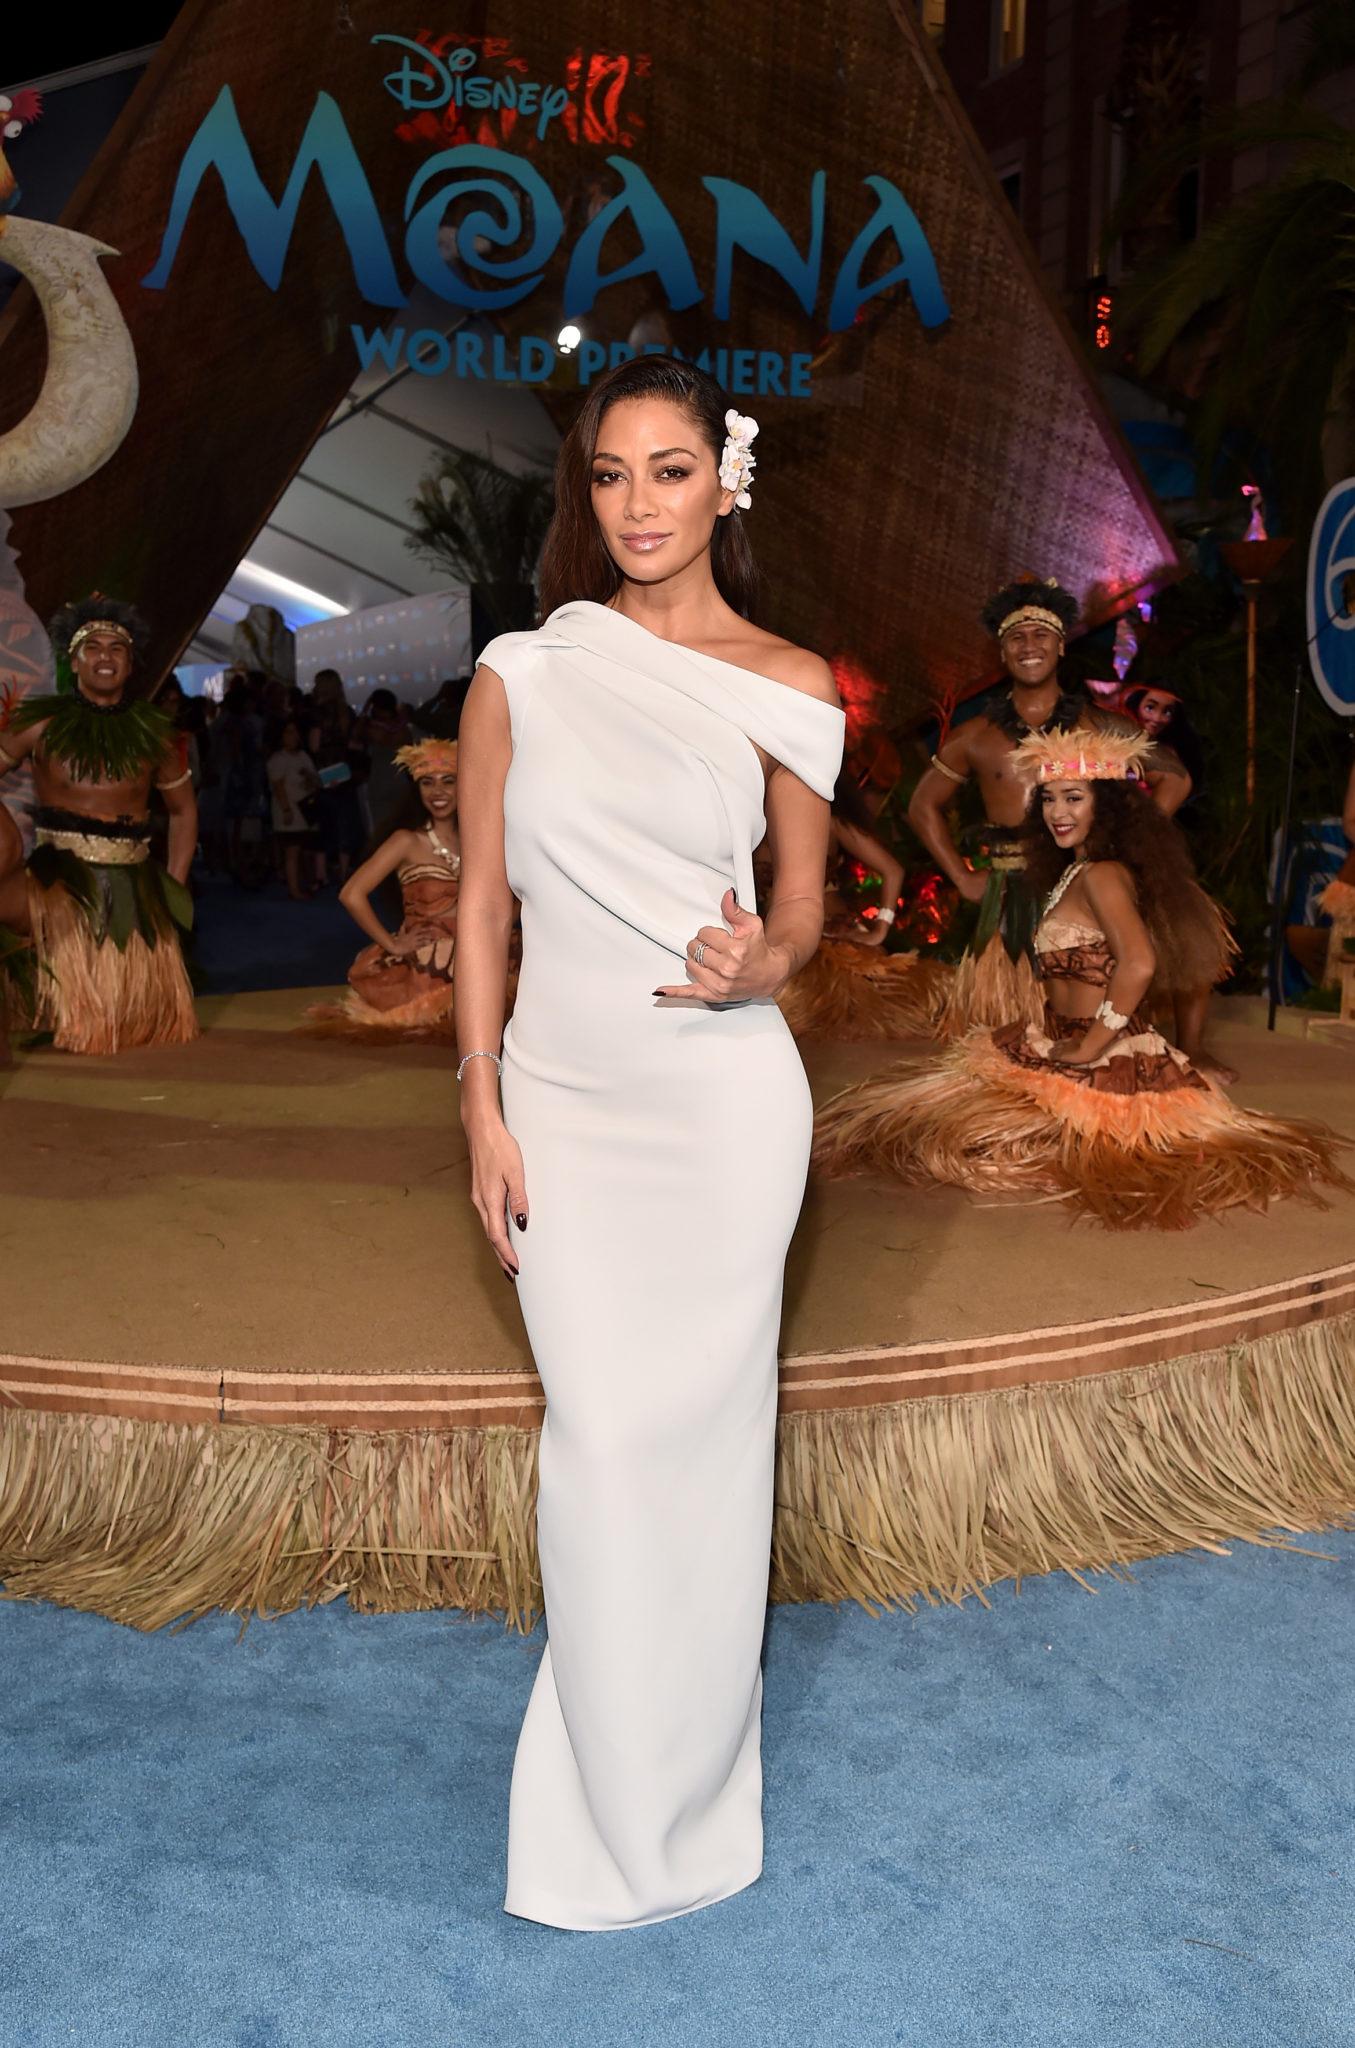 Wardrobe Breakdown: Nicole Scherzinger At Disney's Moana Premiere